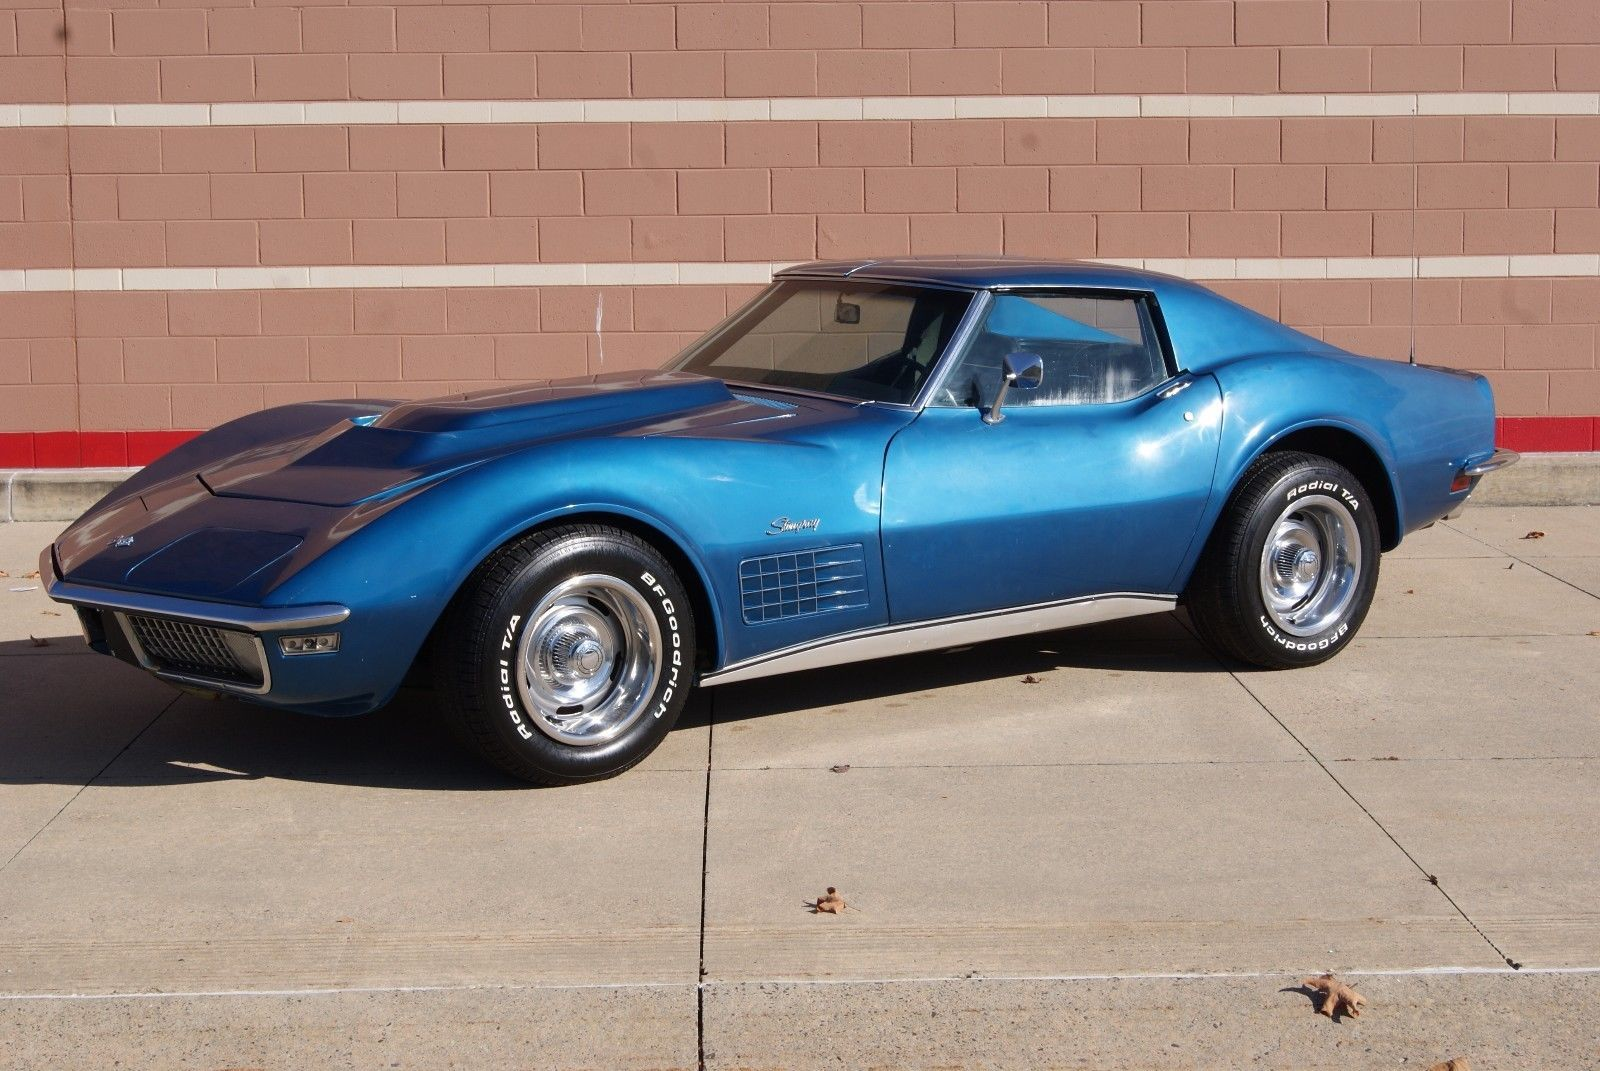 Nice Great 1970 Chevrolet Corvette Stingray 1970 Corvette Stingray Factory A C P W Tilt Wheel Rear Defrost No Rsv 2018 Araba Sanati Araba